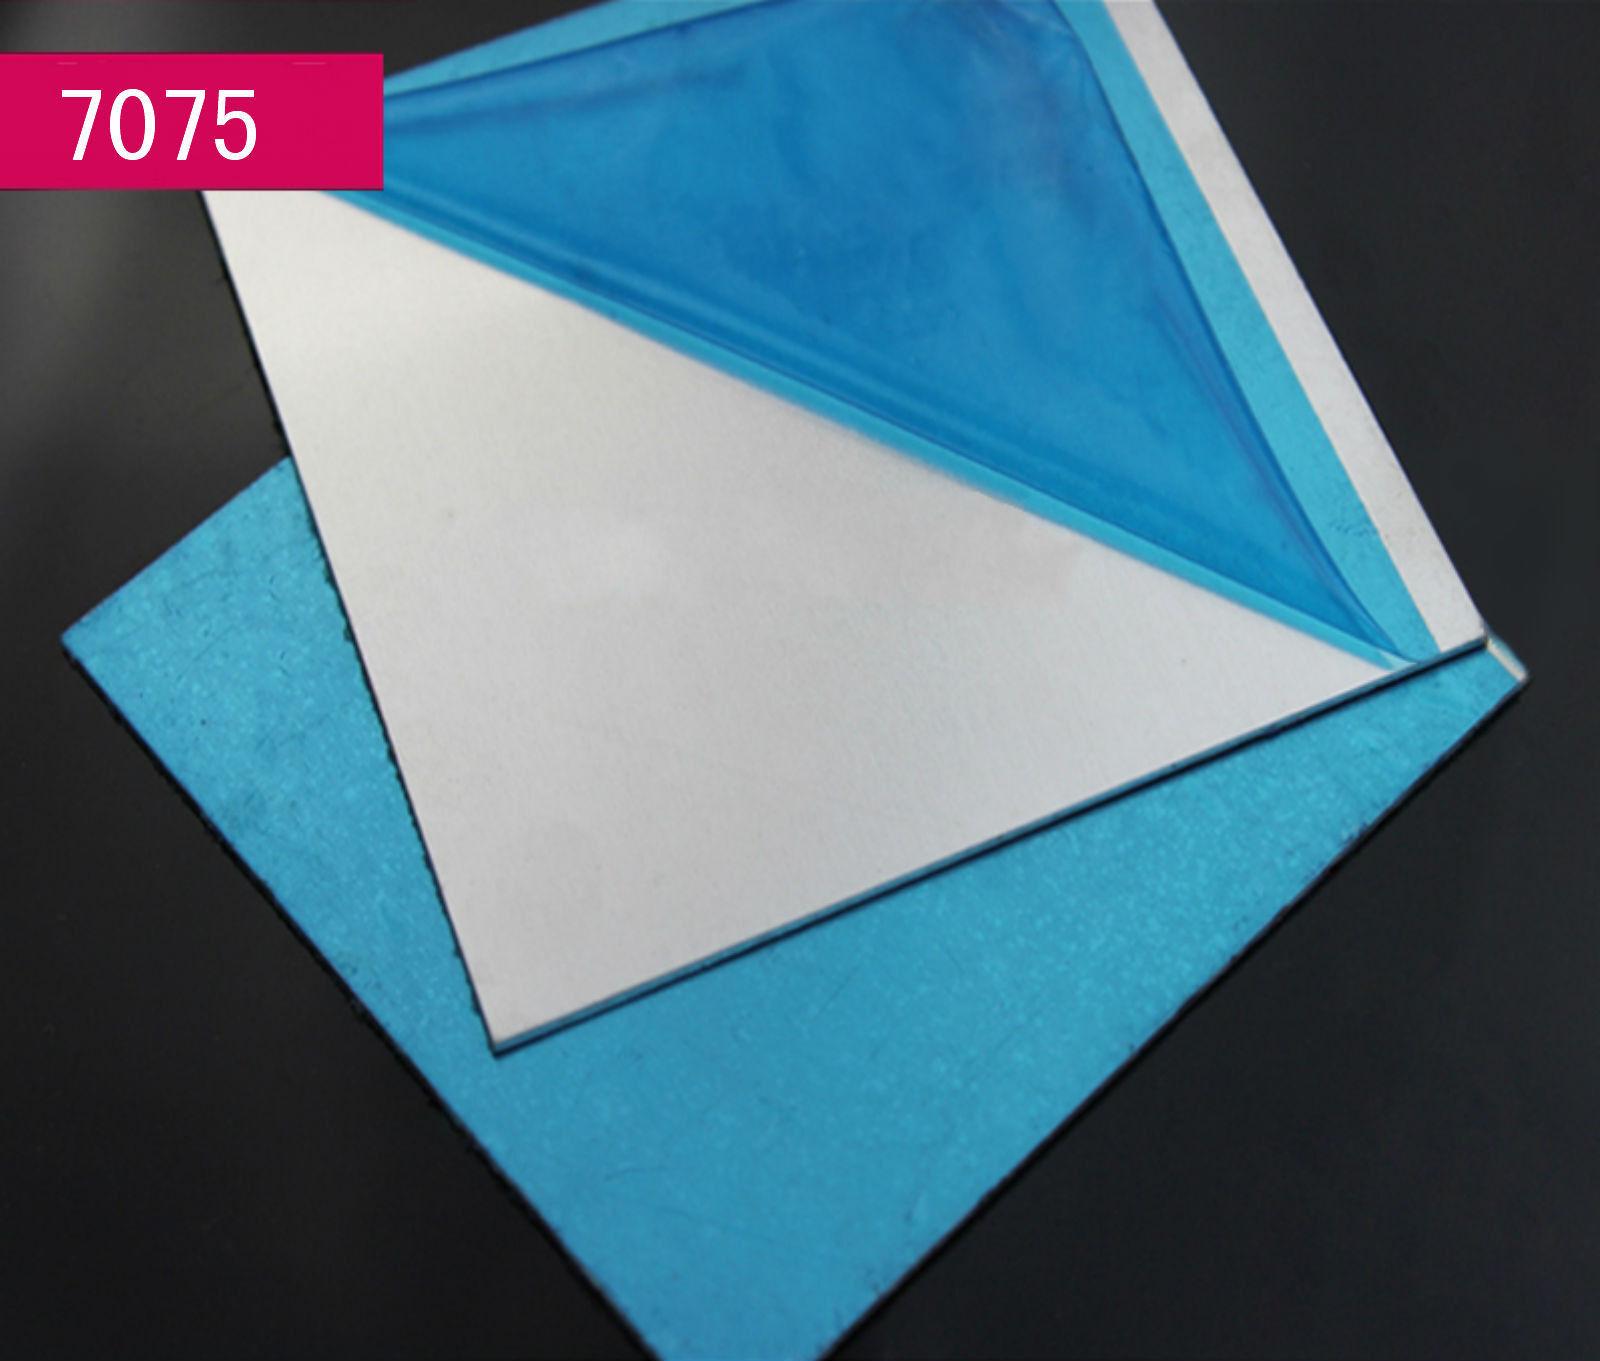 100mm 1pc 7075 Aluminum Al Alloy Shiny Polished Plate Sheet 2mm 100mm